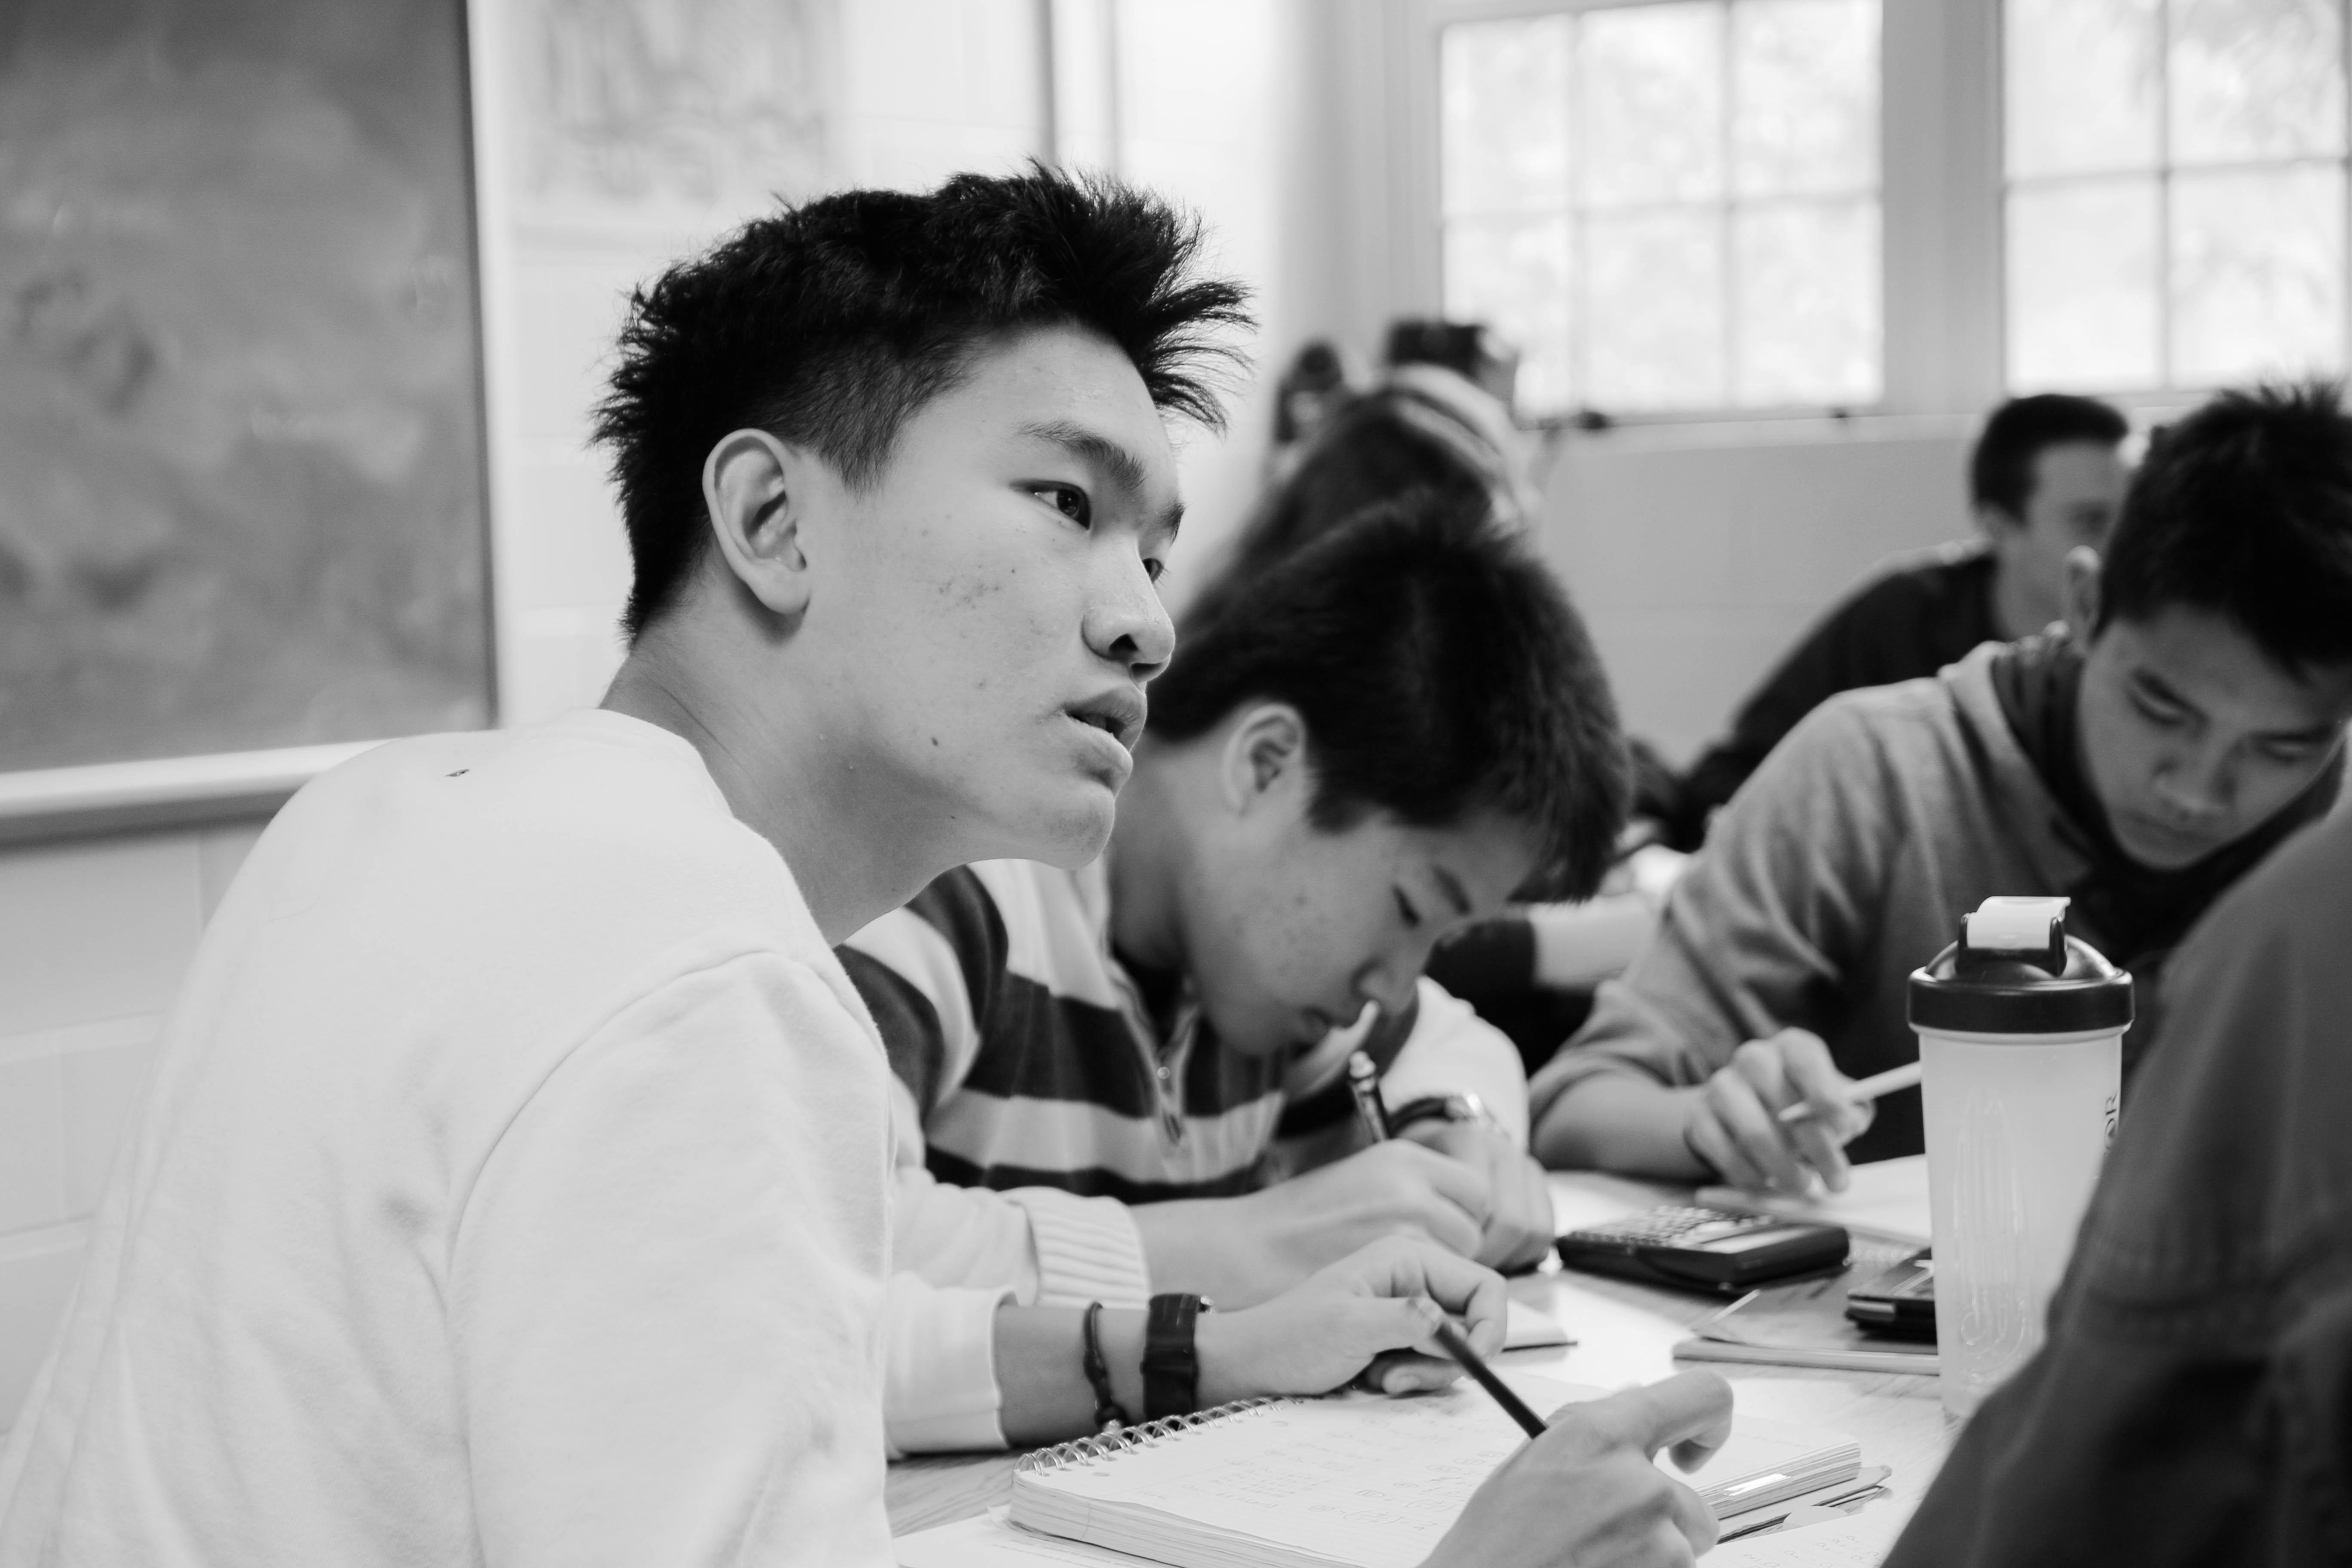 Proctor Academy Coates Collaborative